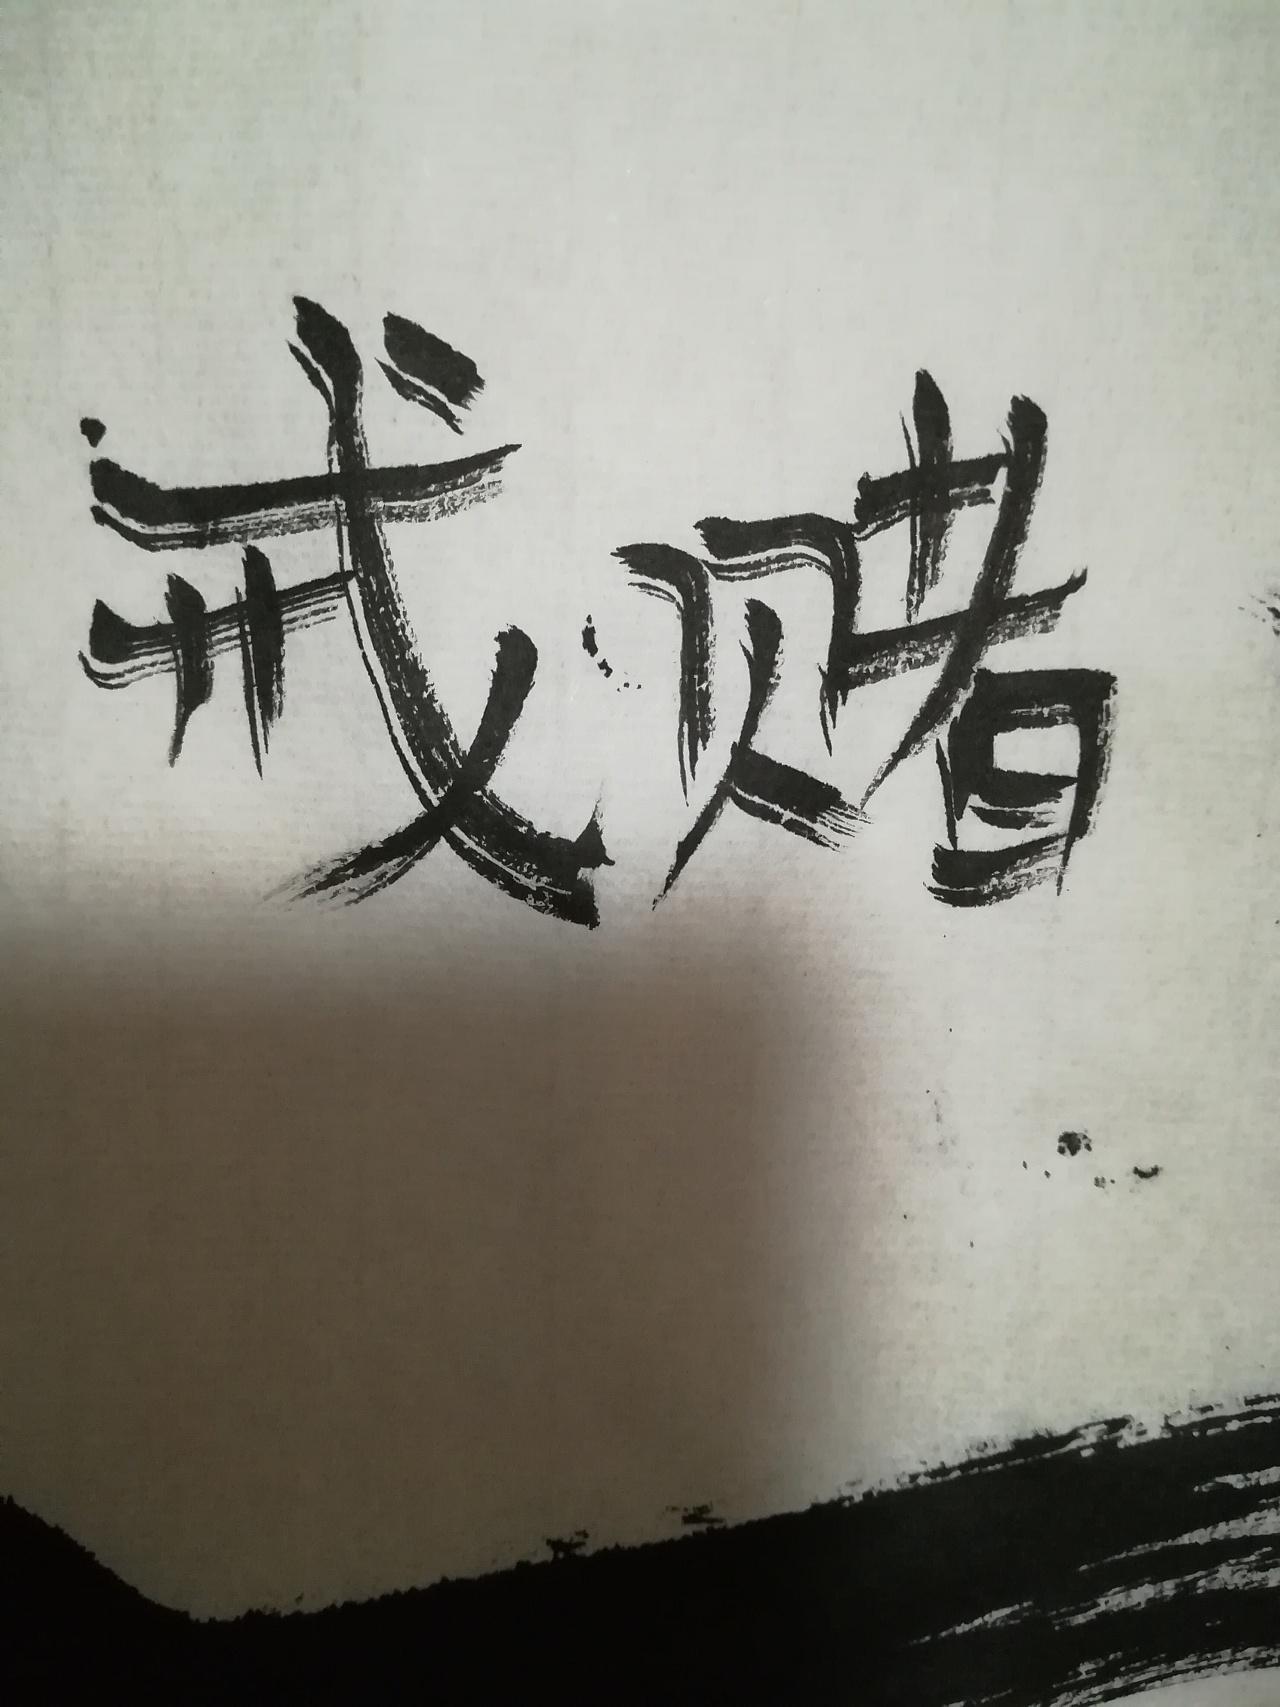 chinesefontdesign.com 2018 05 17 02 52 41 324566 75P Novel creative calligraphy design scheme